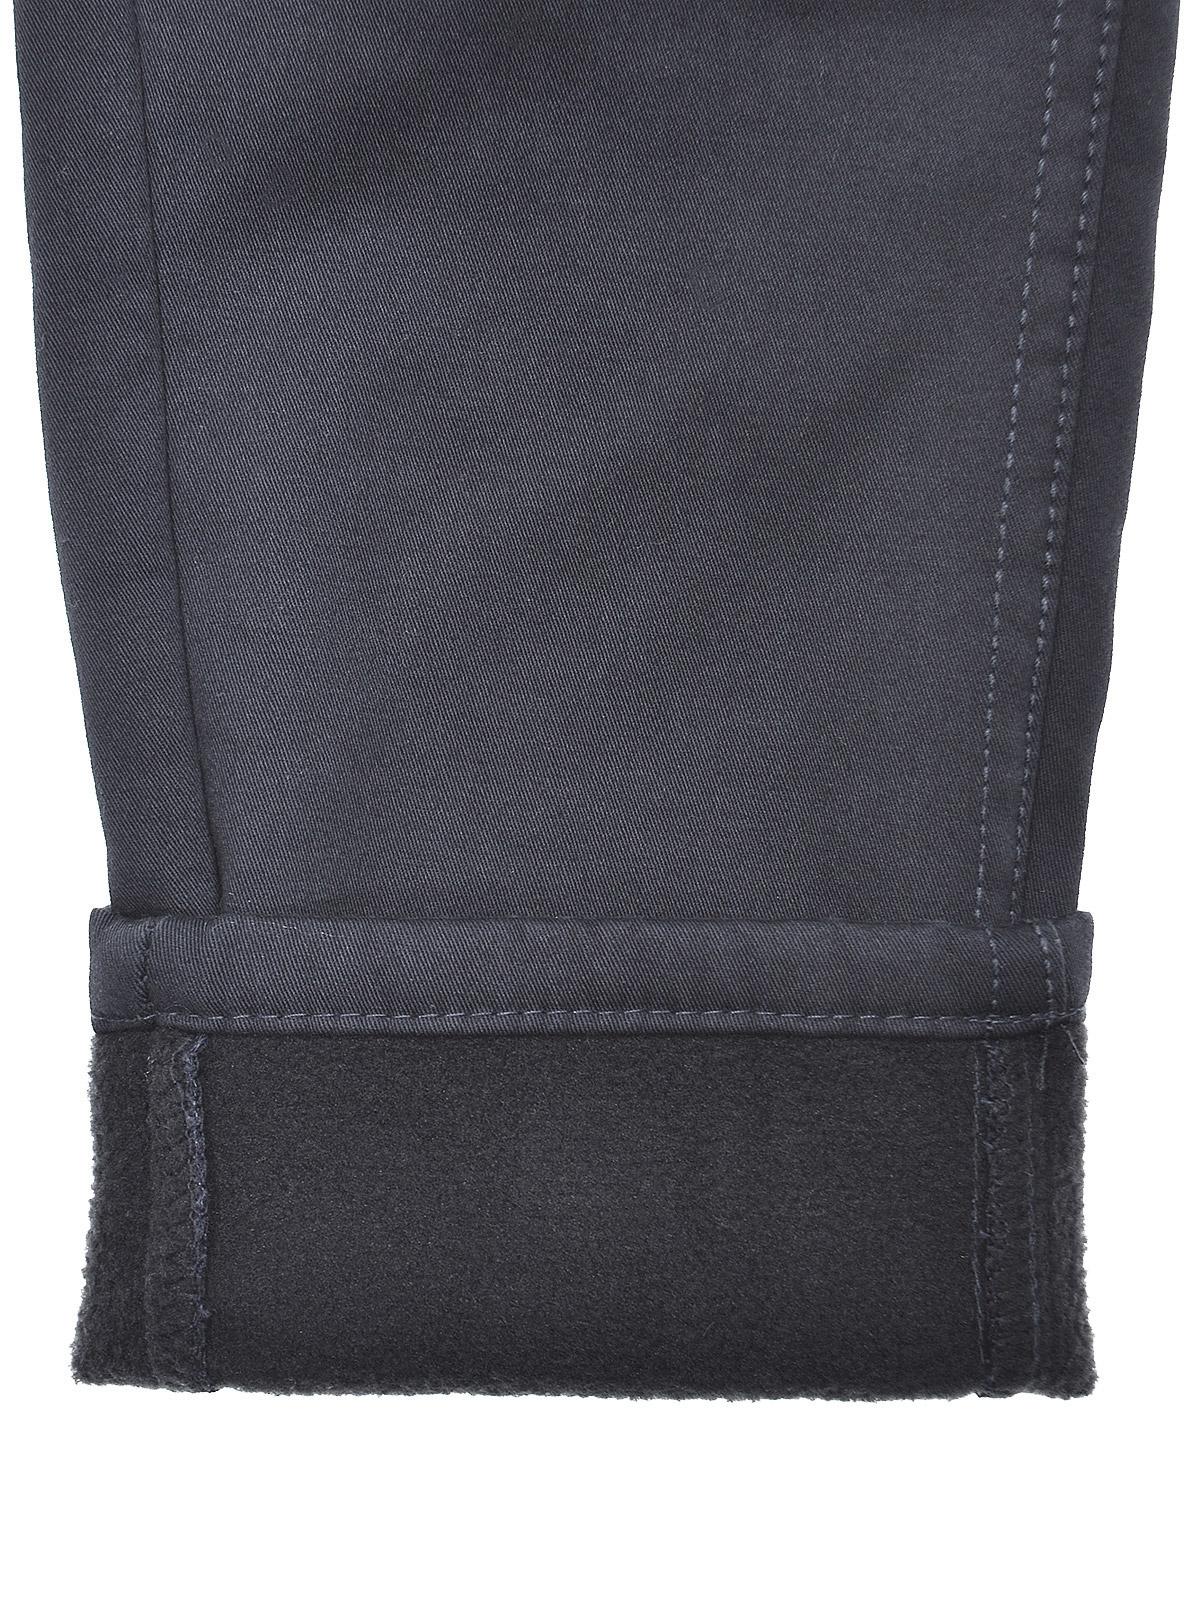 Enfants-Chino-THERMO-d-039-hiver-Pantalons-Garcons-Pantalon-Doublure-Stretch-Reglable-22904 miniature 9